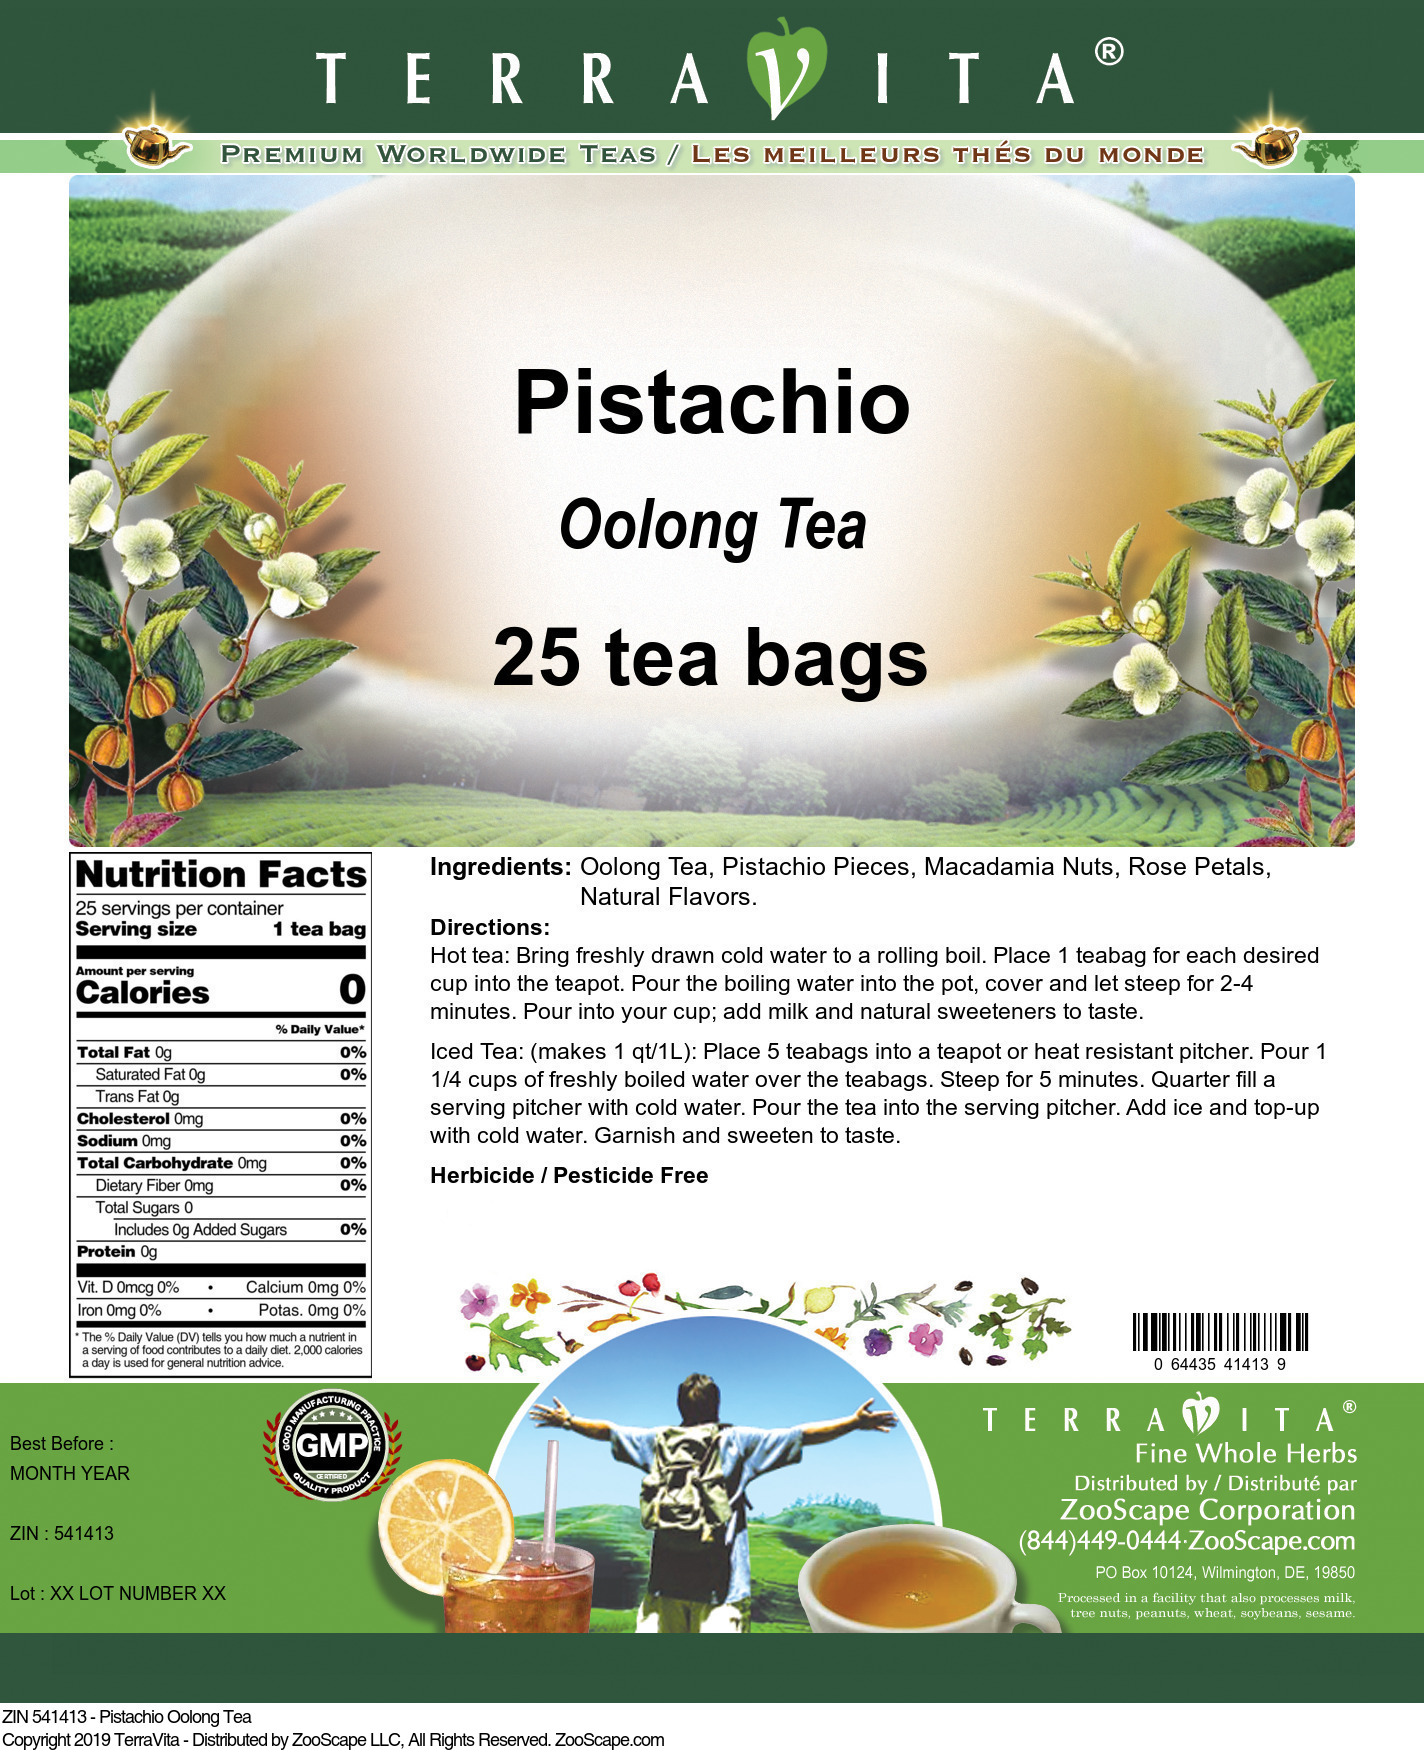 Pistachio Oolong Tea